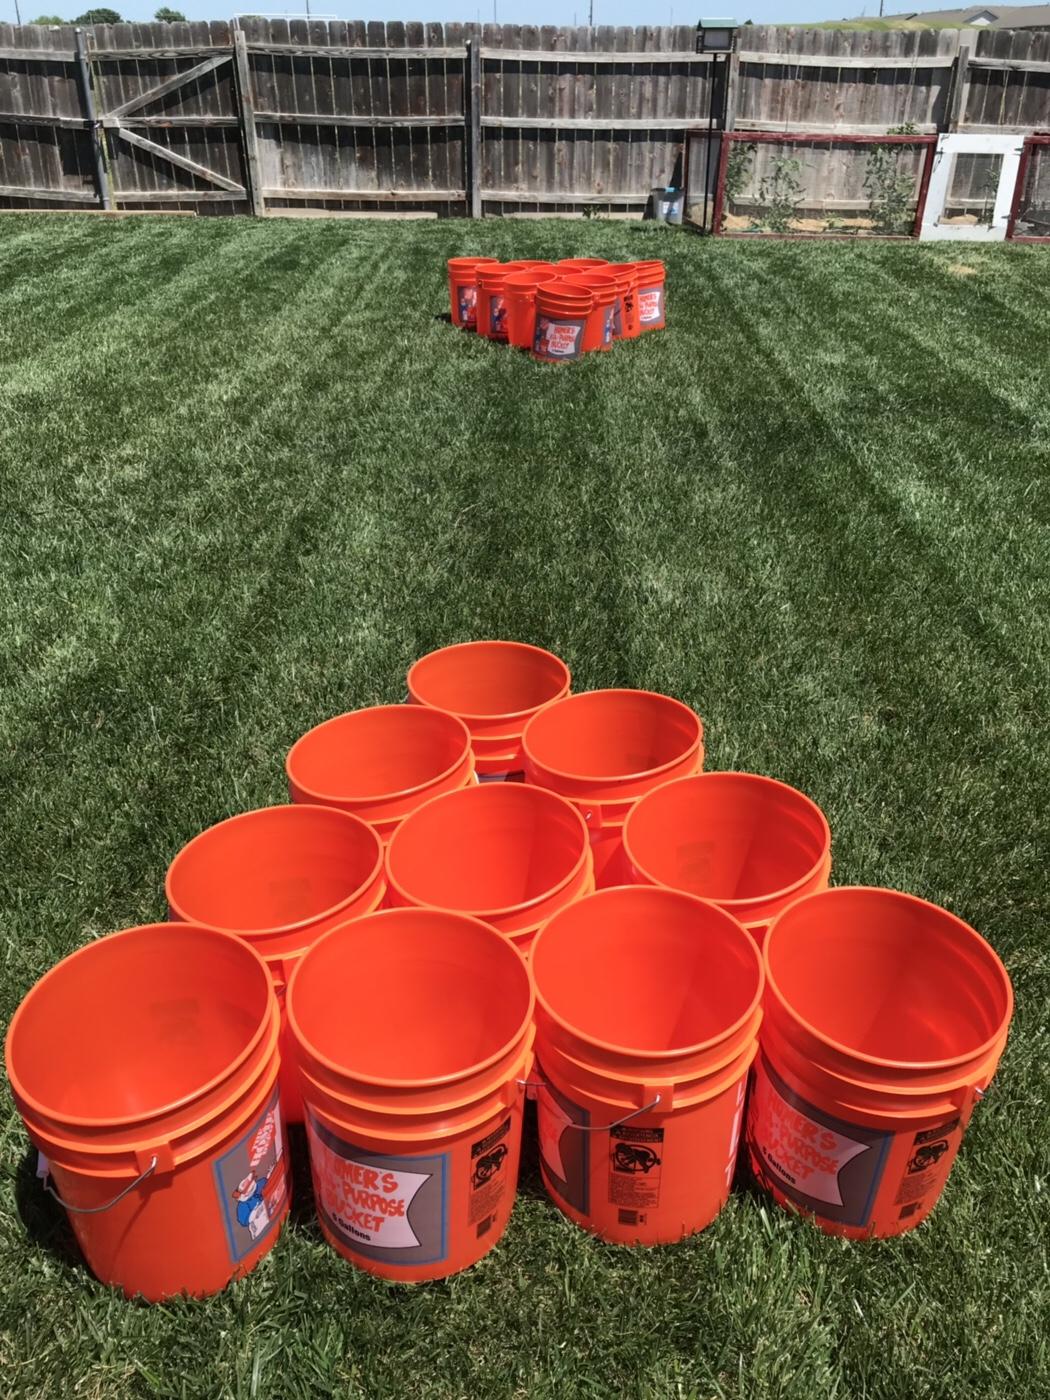 Bucket Ball DIY: The perfect yard game – Wichita By E.B.